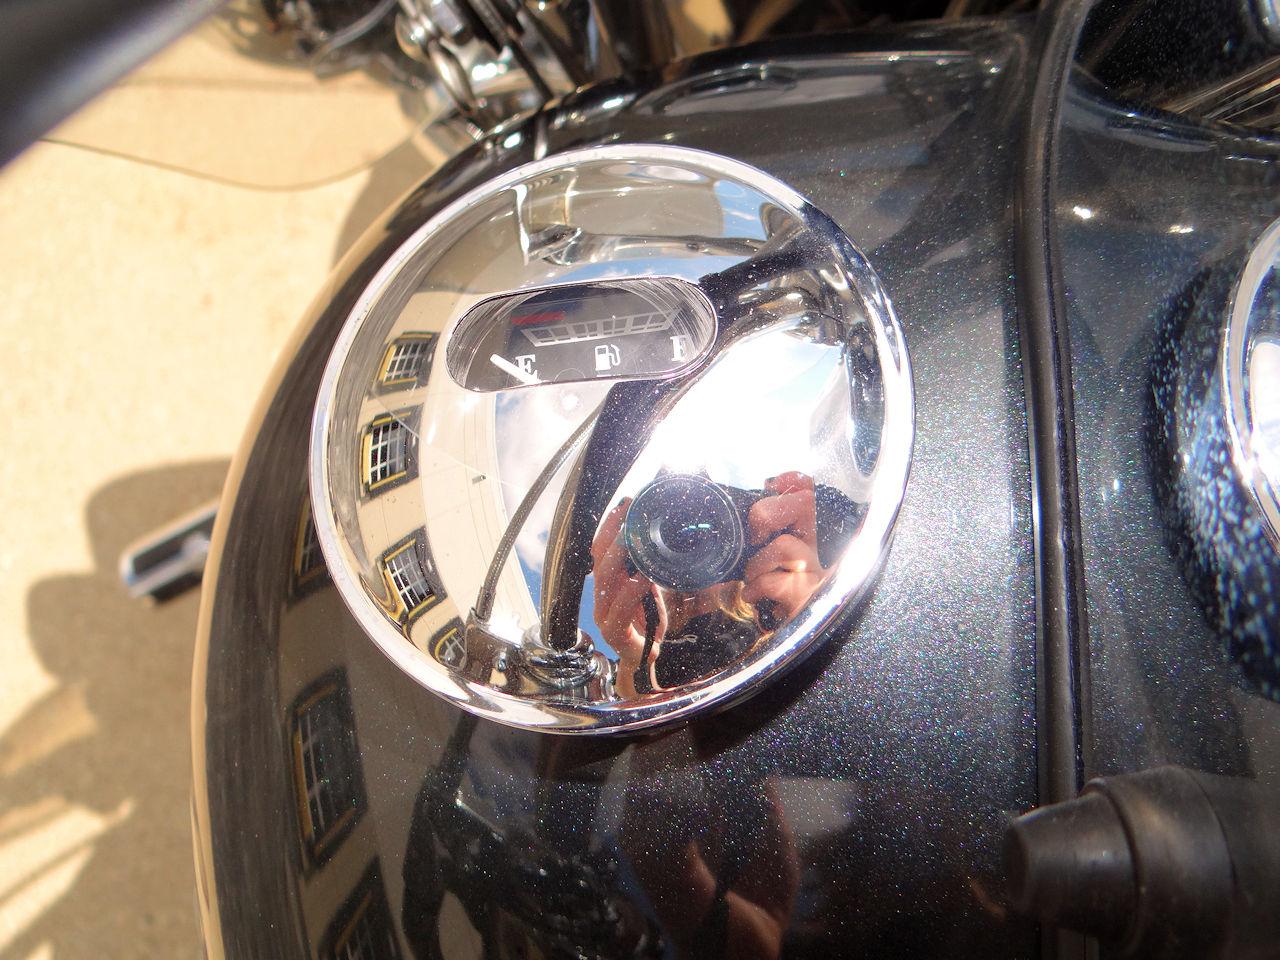 2006 Harley Davidson FLSTNI 75